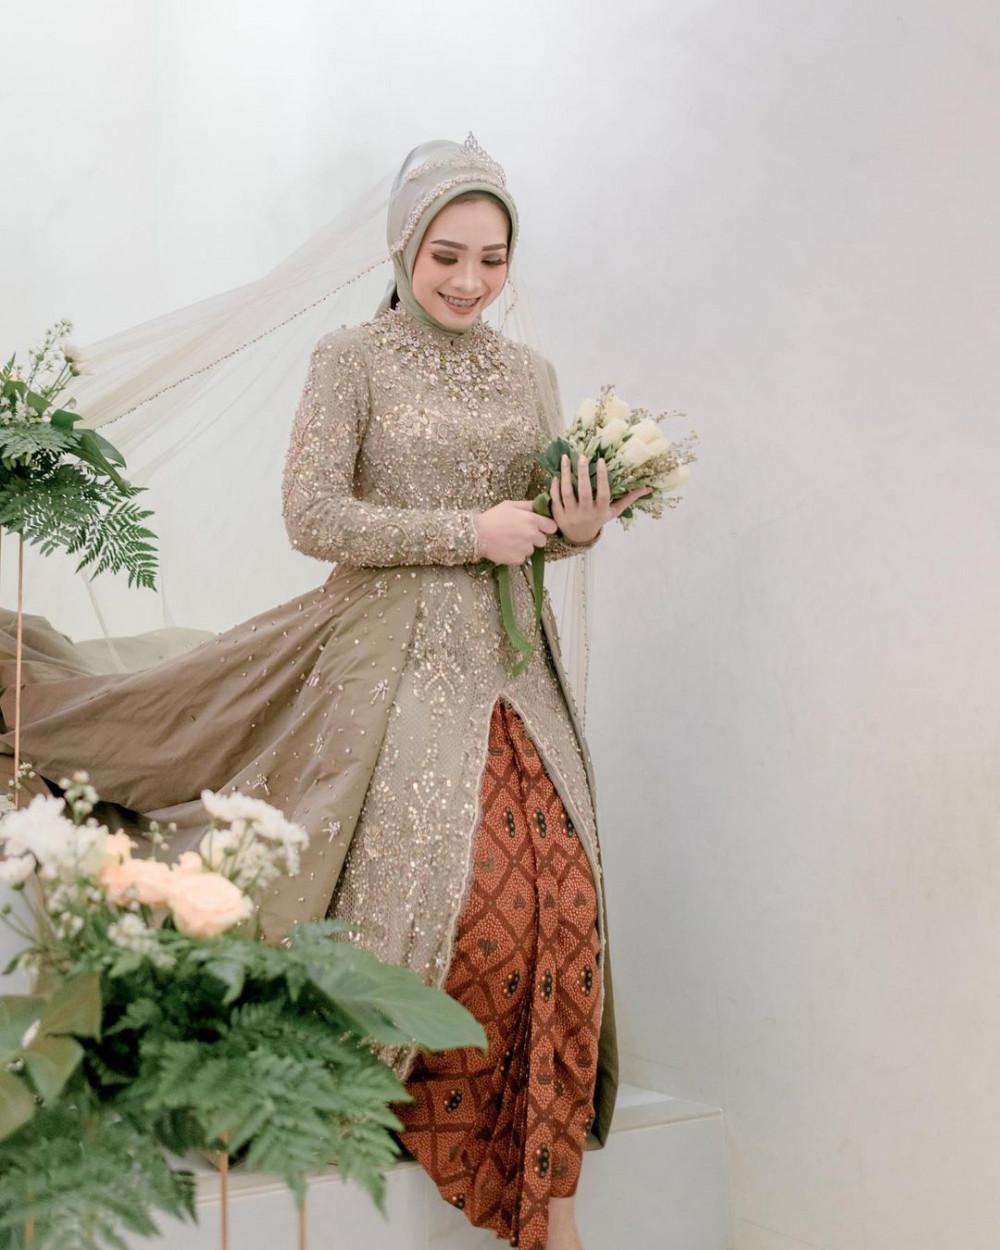 Rekomendasi Vendor untuk Sewa Gaun Pengantin Muslimah di Jakarta